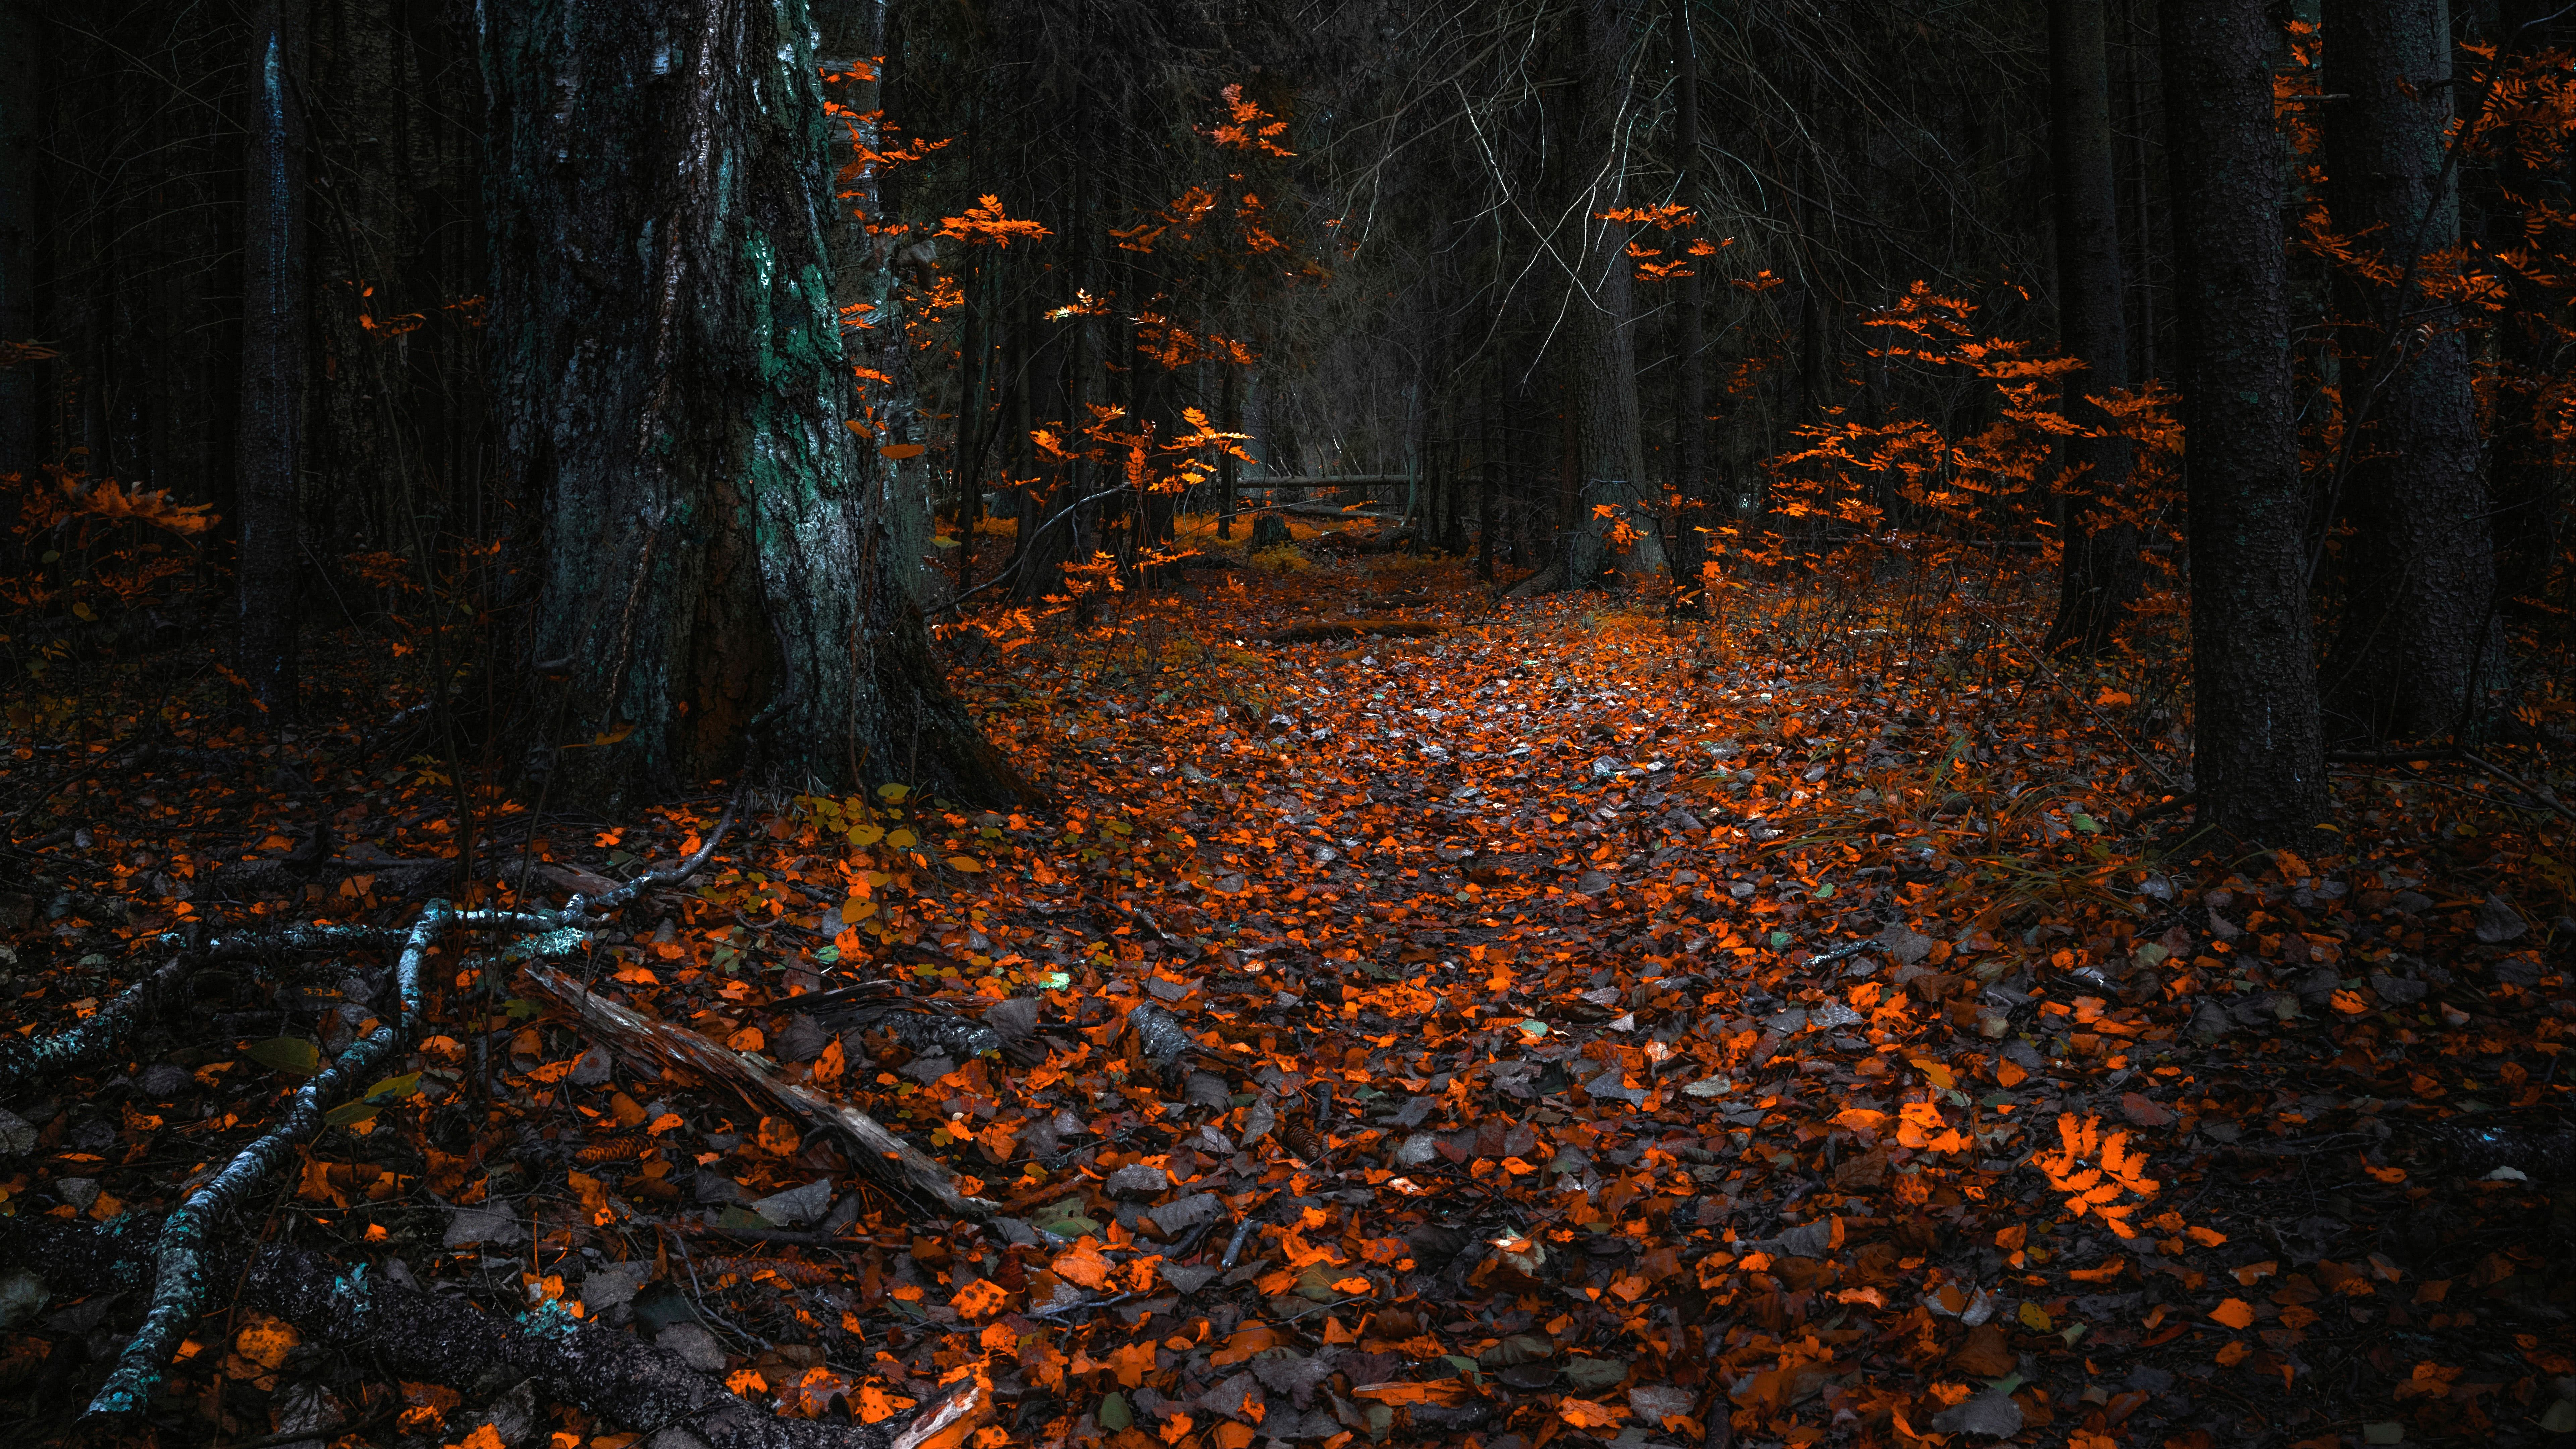 Dark Fall Wallpapers Top Free Dark Fall Backgrounds Wallpaperaccess